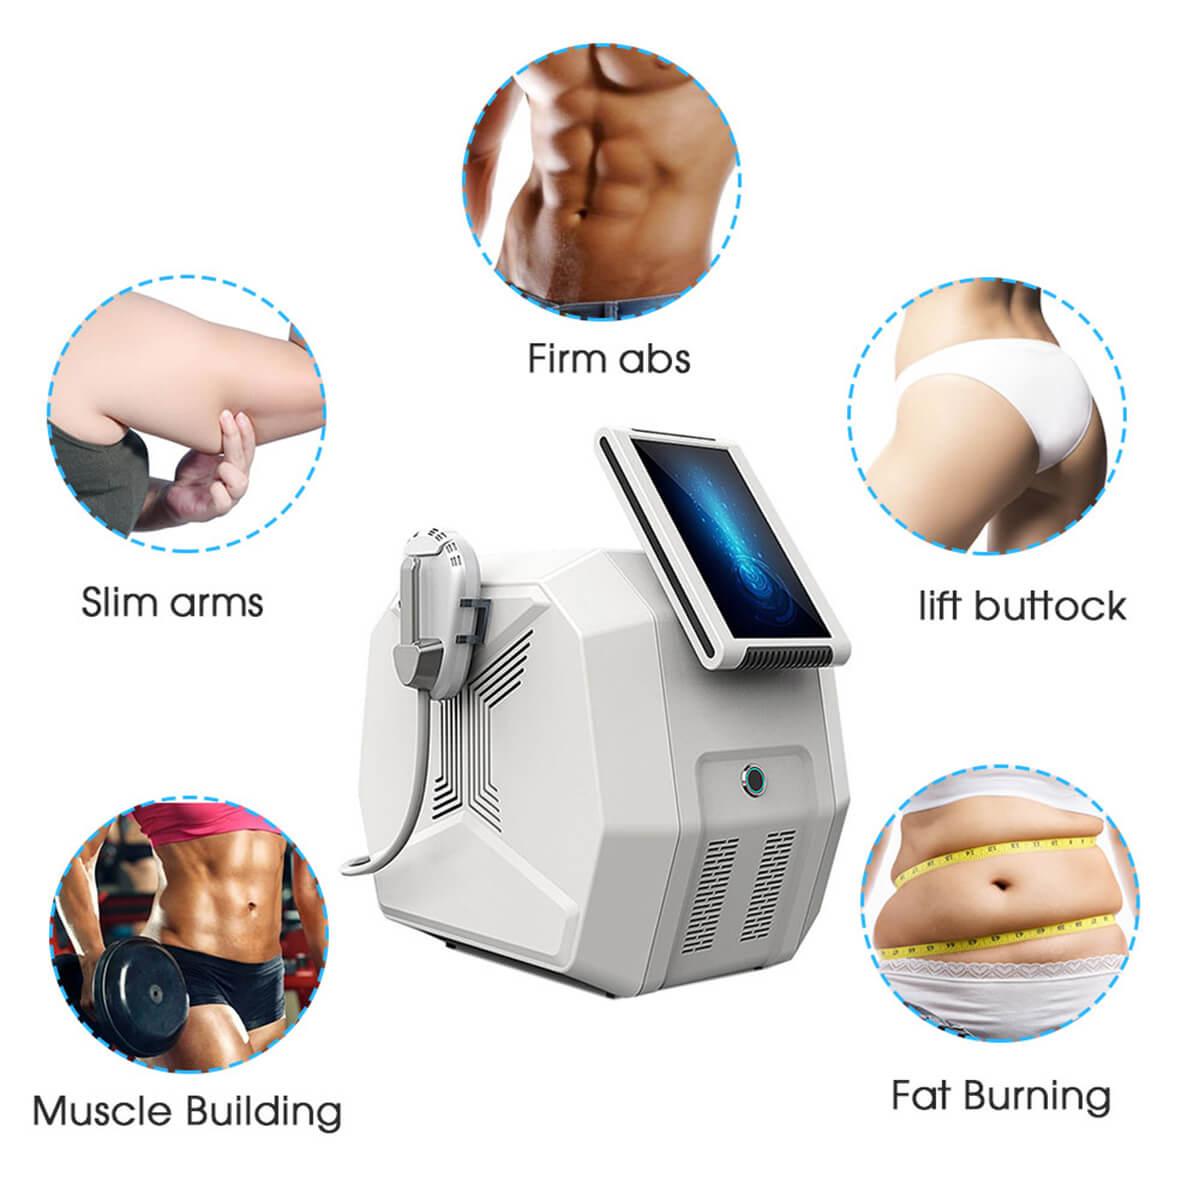 ems stimulation machine 3